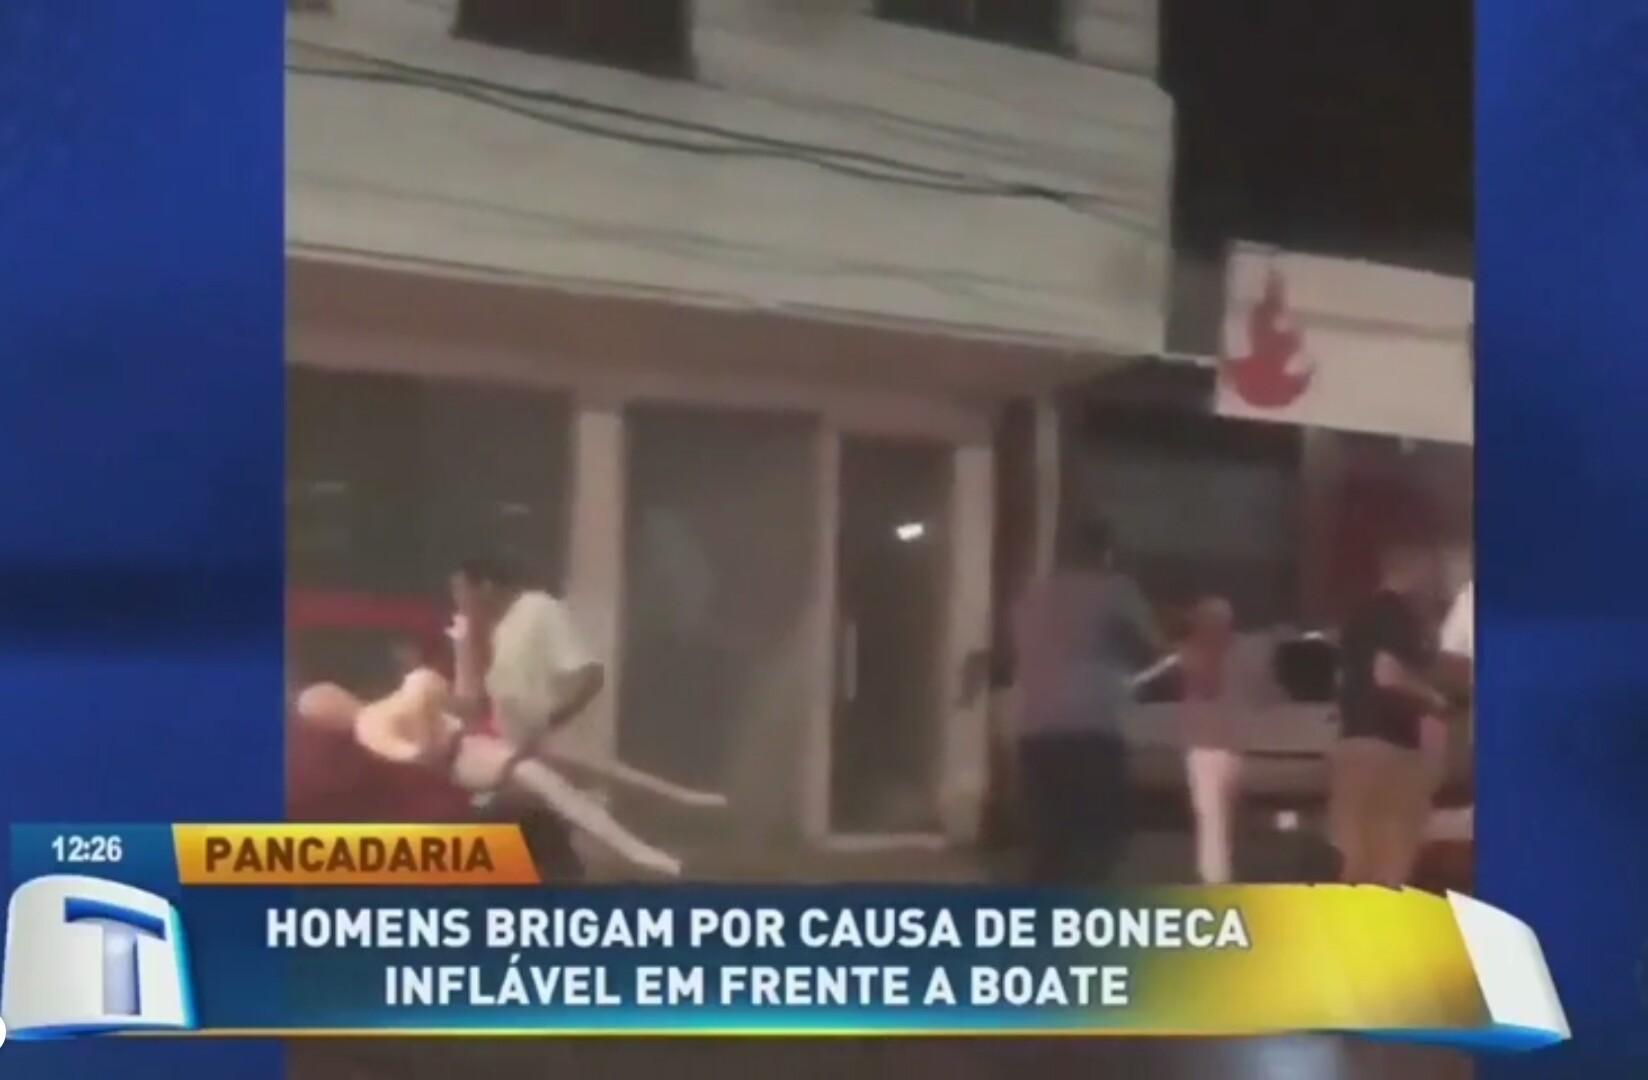 Esse é meu Brasil - meme